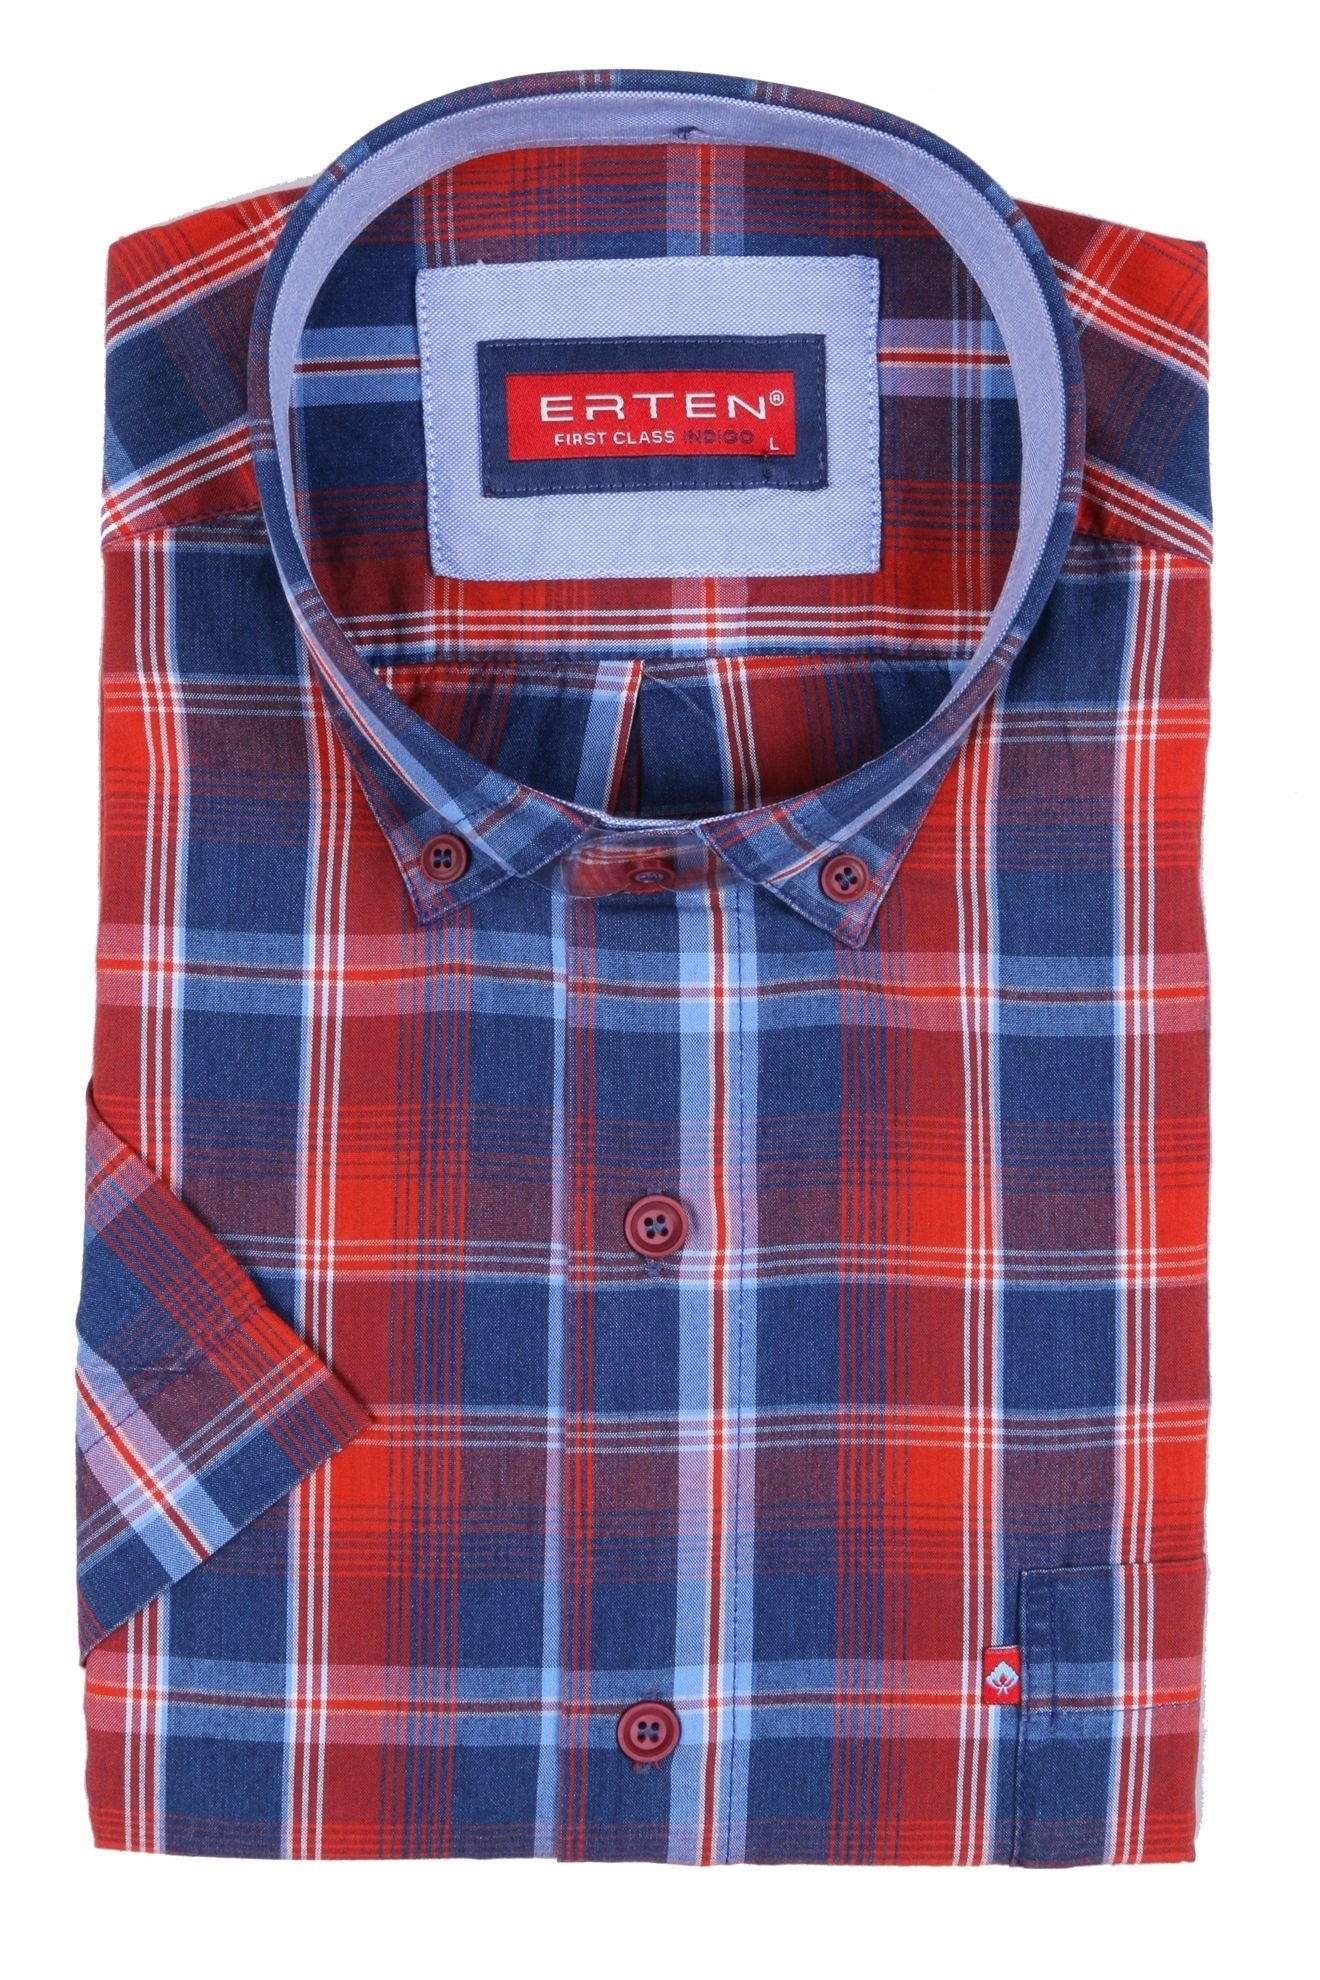 Рубашка в клетку с коротким рукавом (Арт. T 2379K)